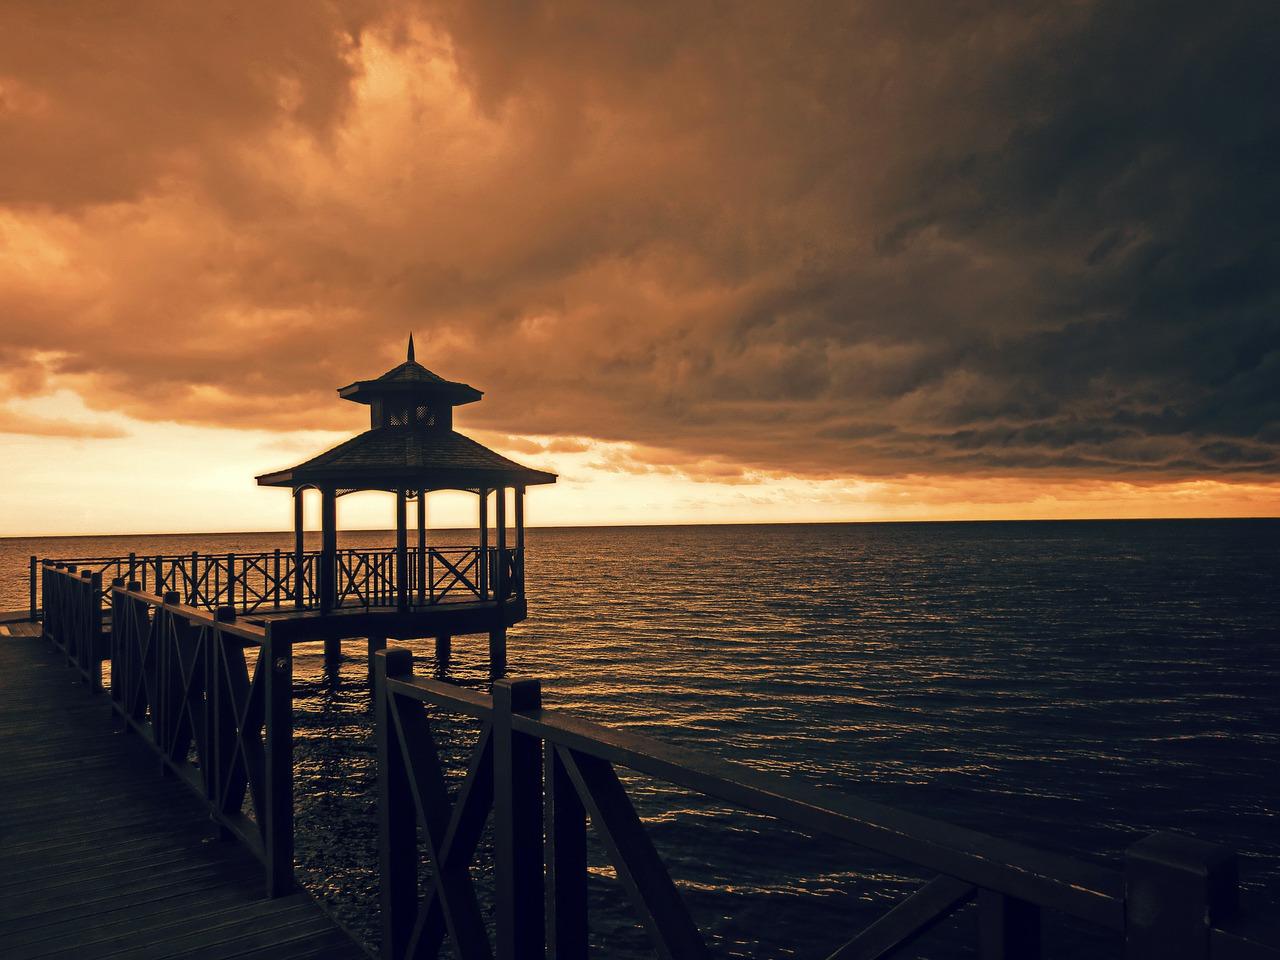 Walkboard_Jamaica sunset_PD